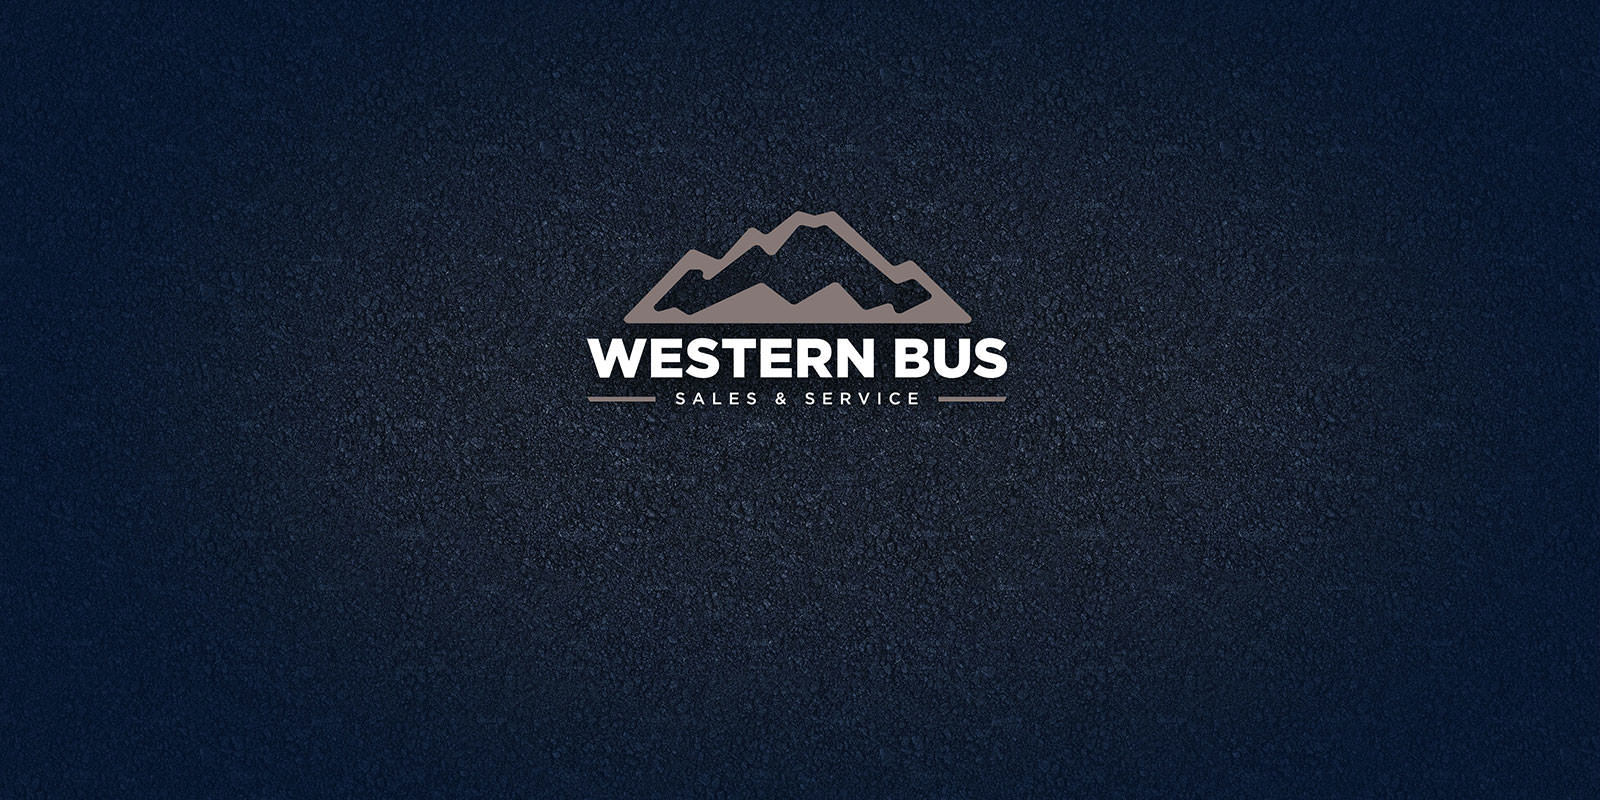 Western Bus